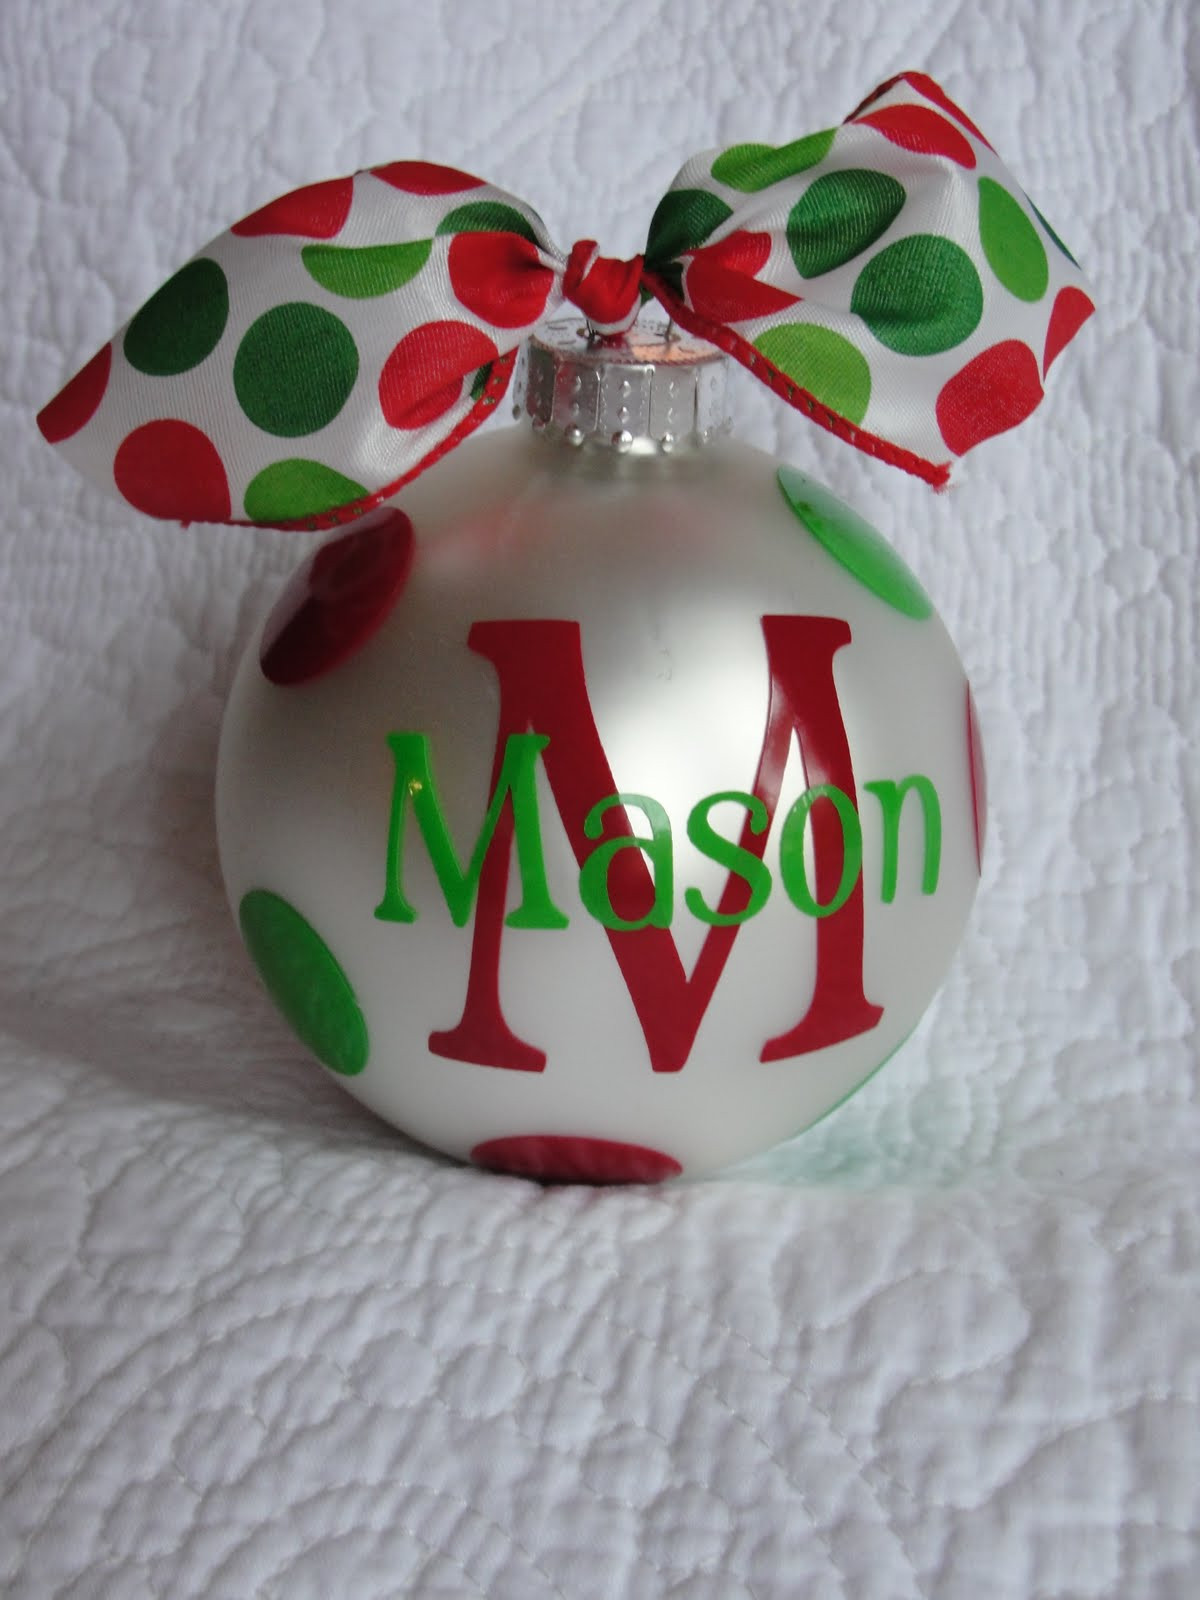 Craft To Make For Christmas  Rantin & Ravin HOMEMADE ORNAMENTS